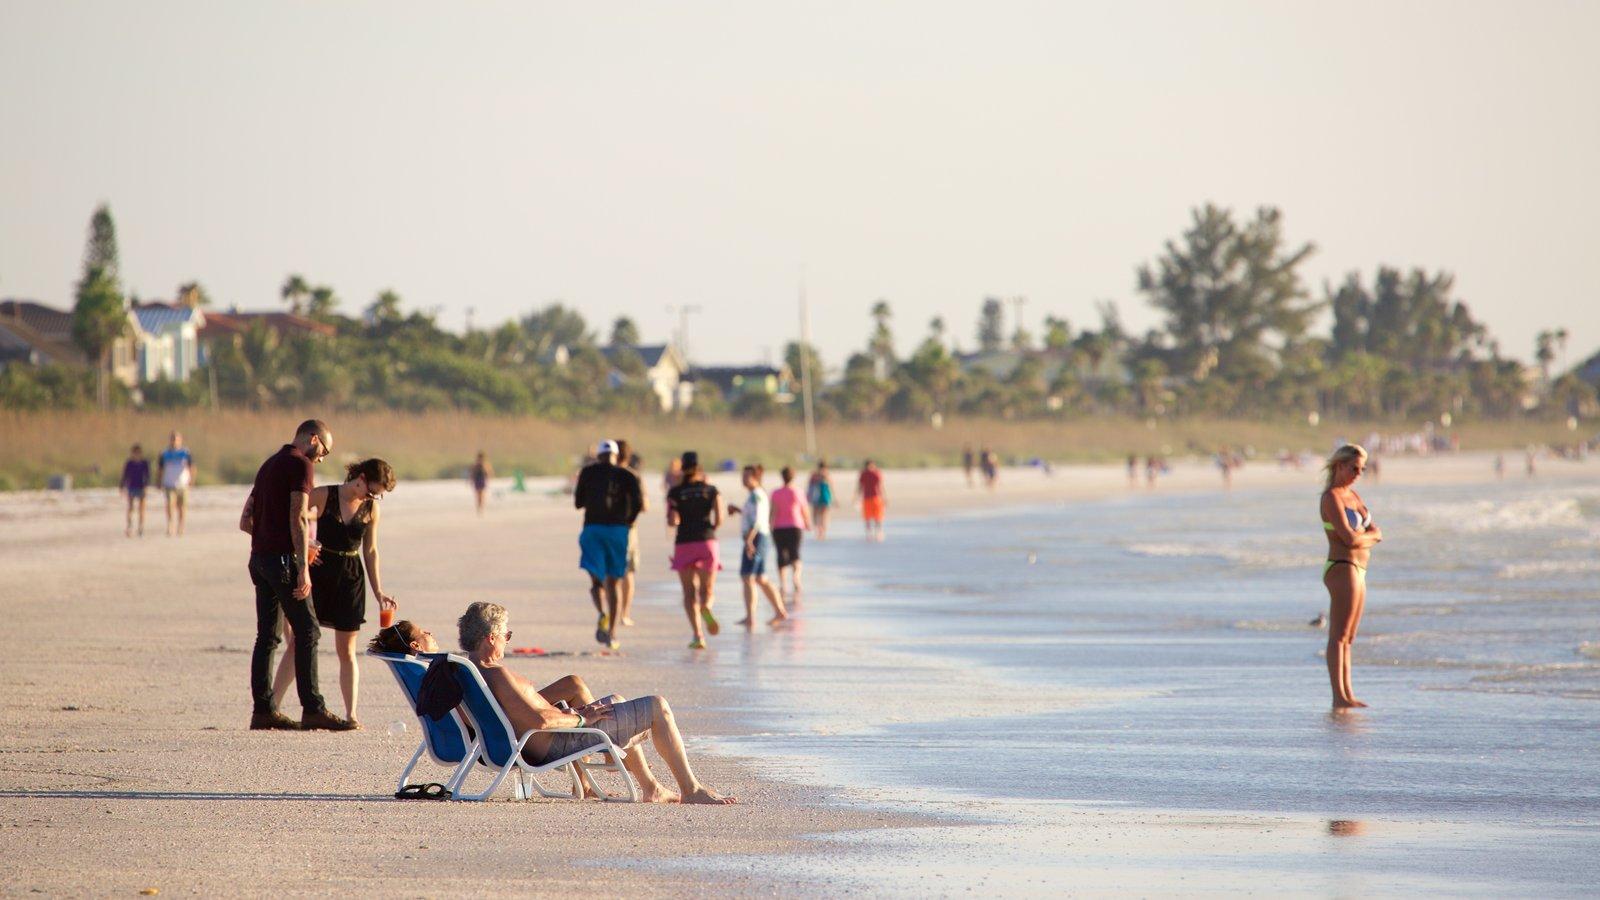 St. Petersburg showing a sandy beach